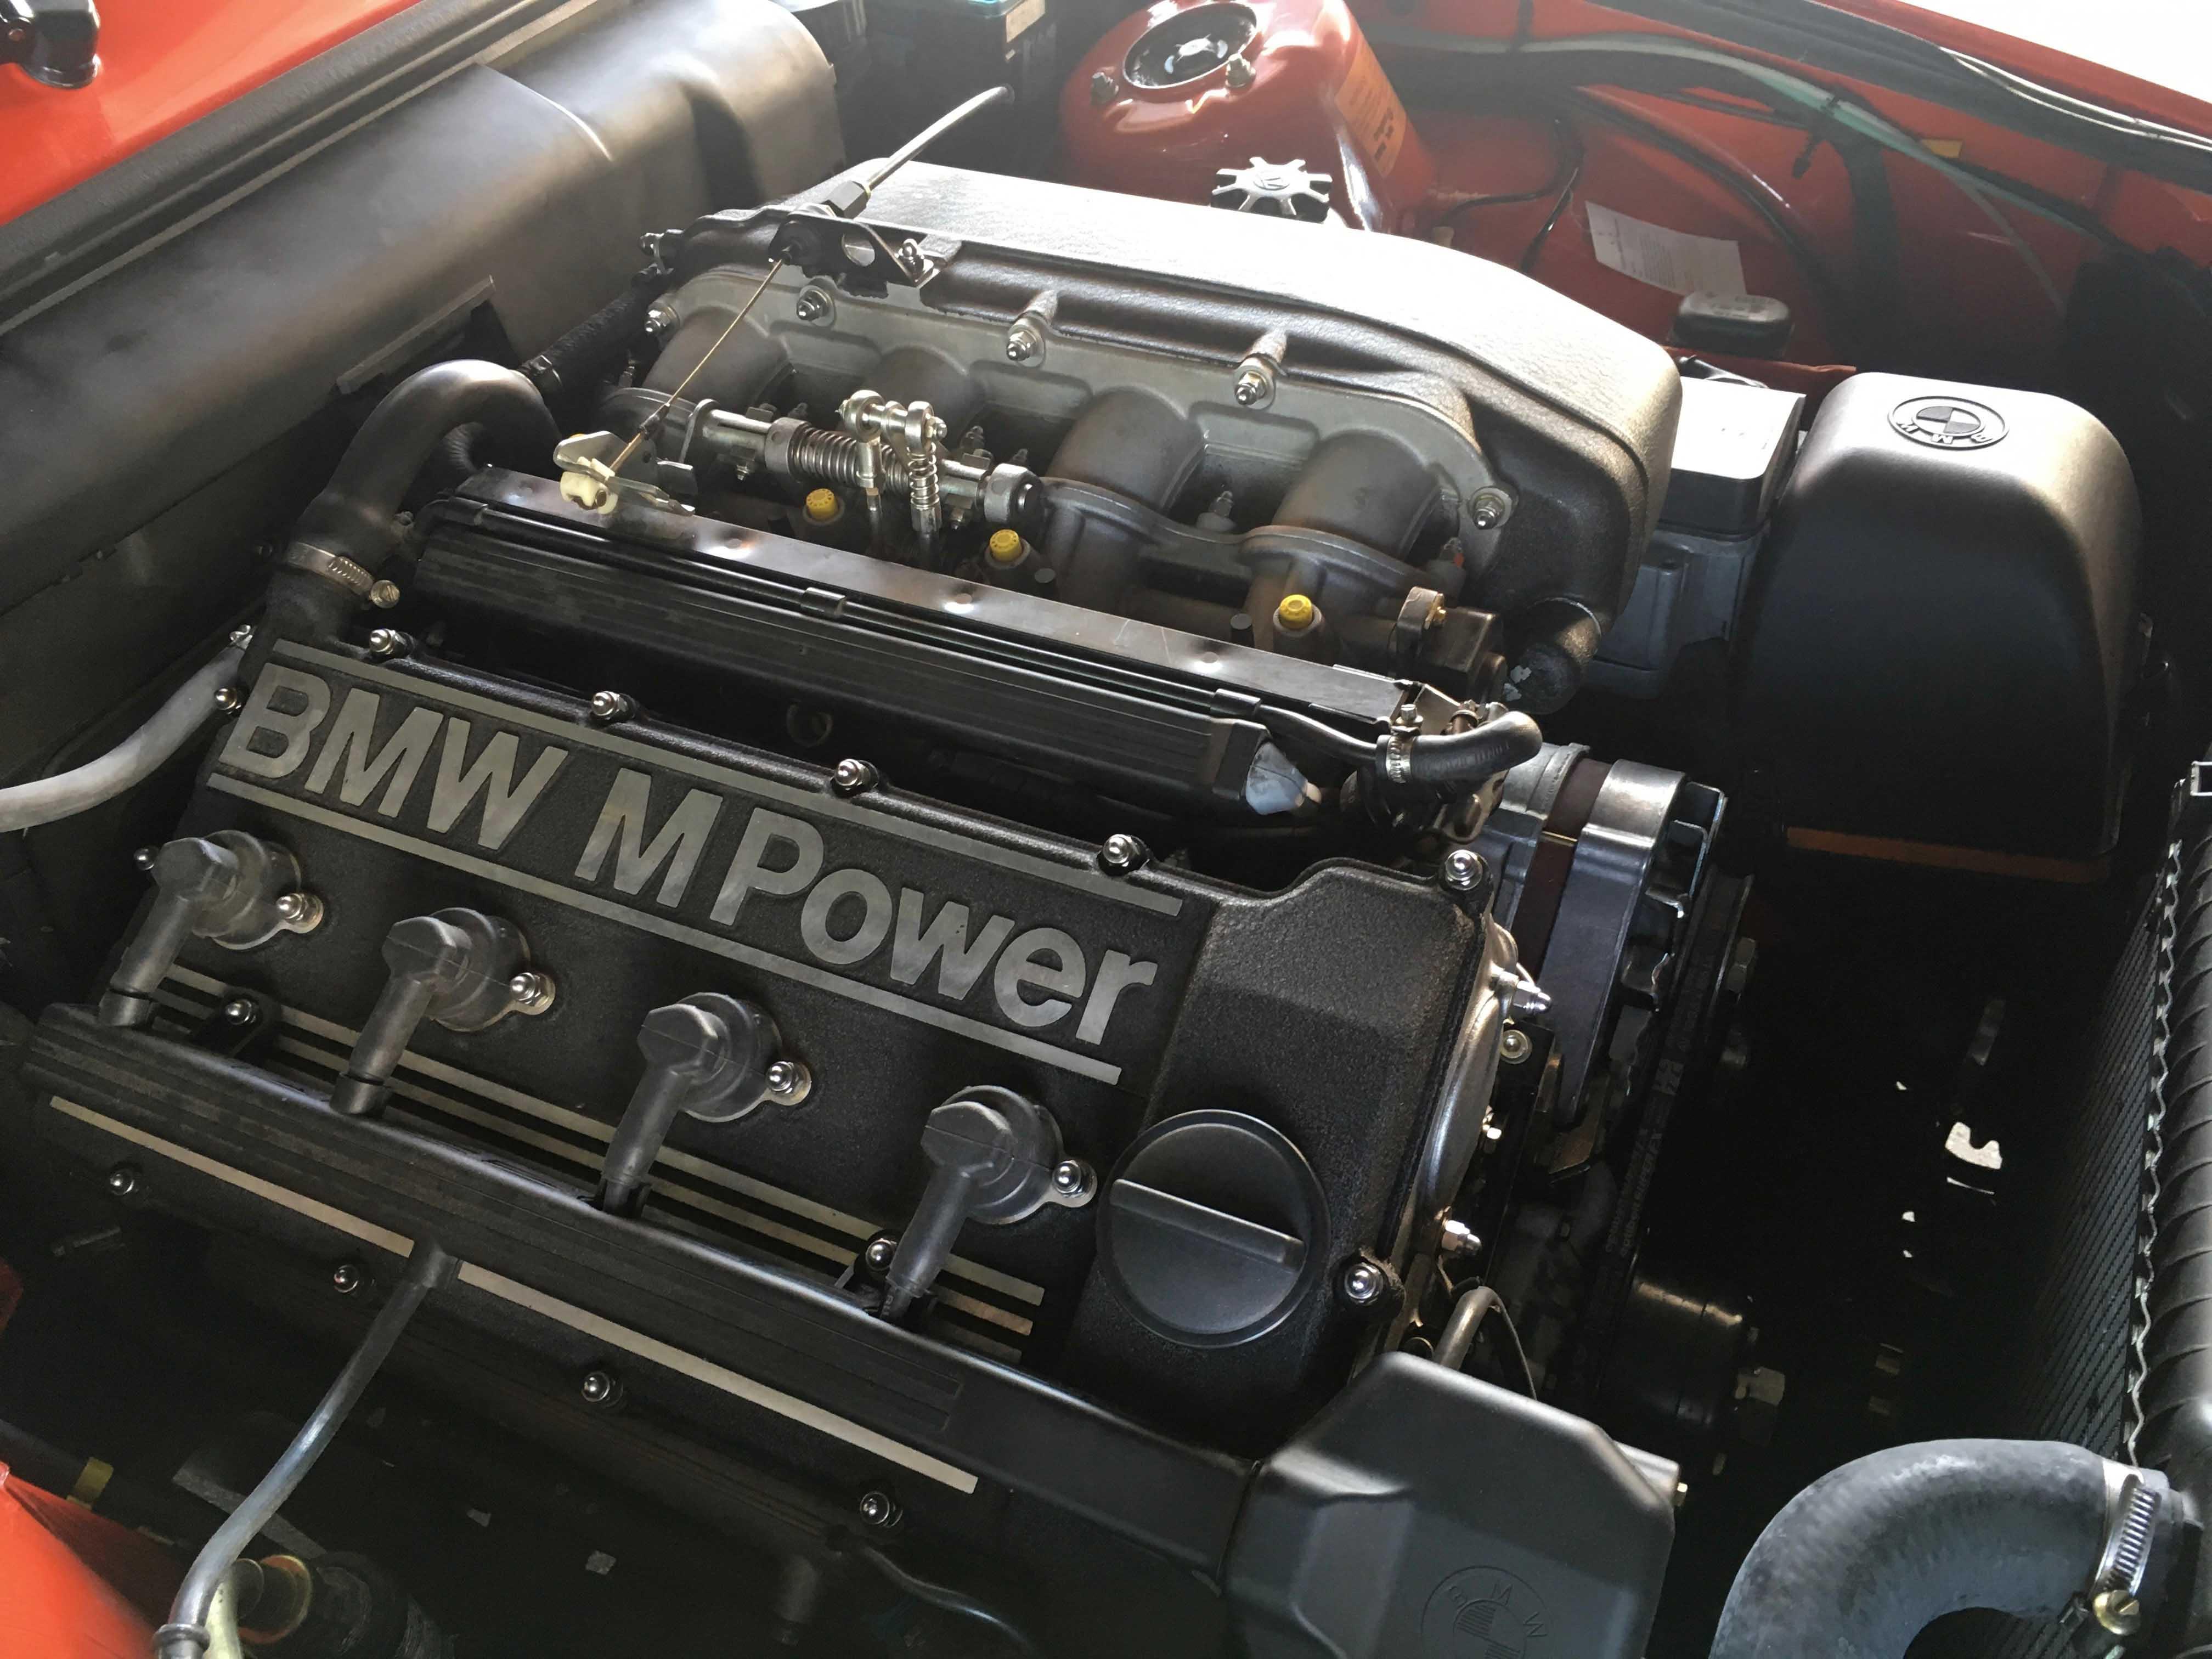 1987 BMW M3 M power Engine